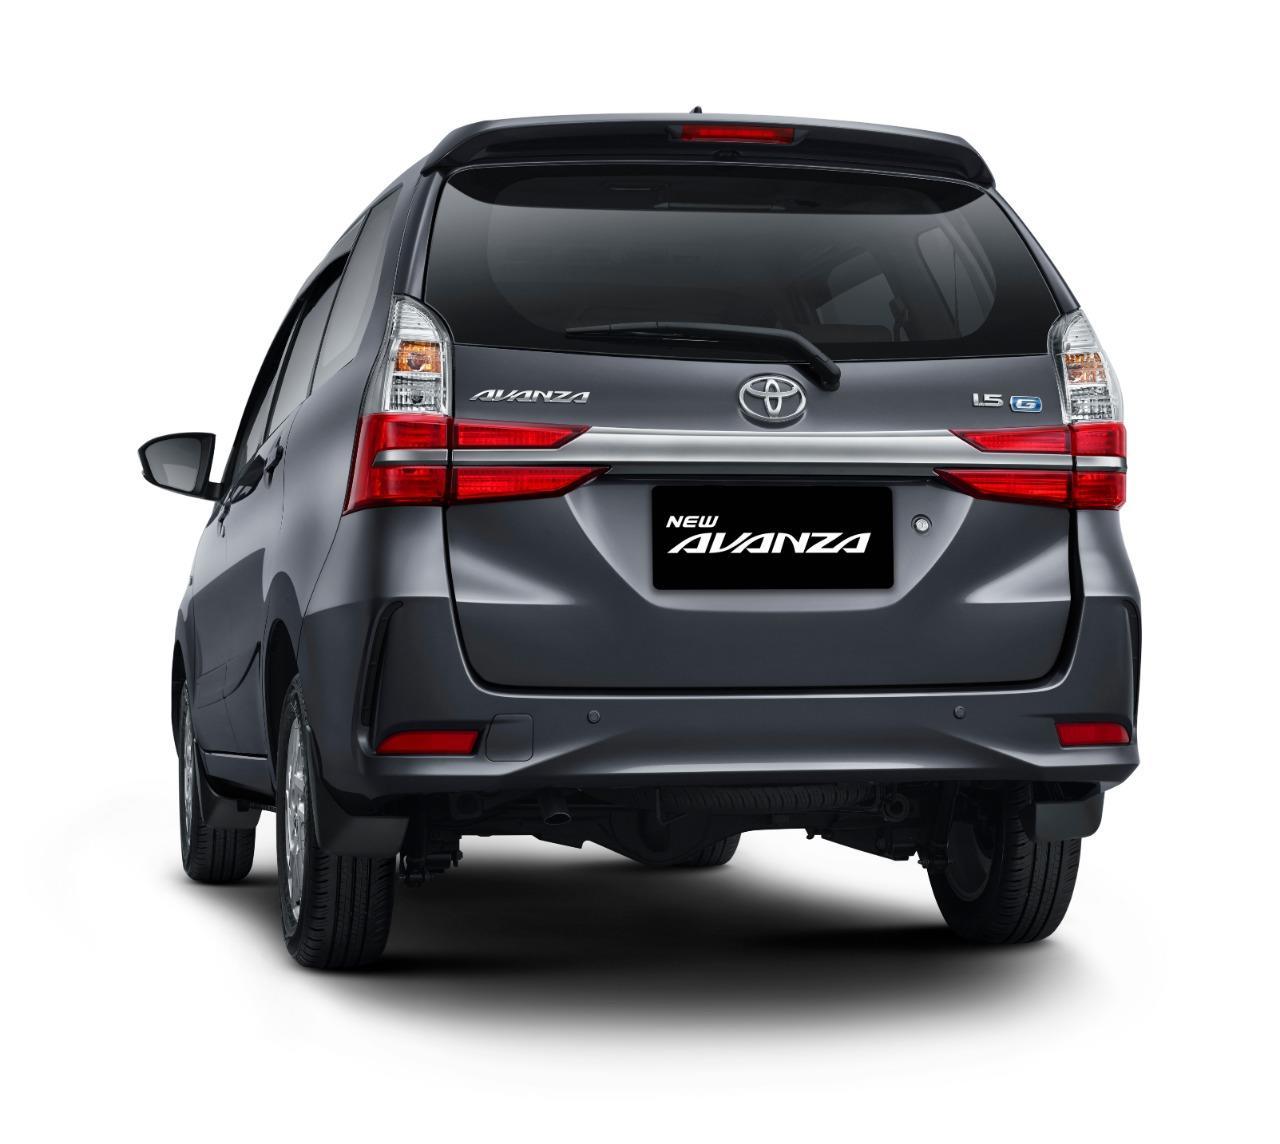 Tampak tampilan belakang New Toyota Avanza 1.5 G M/T 2019 berwarna hitam